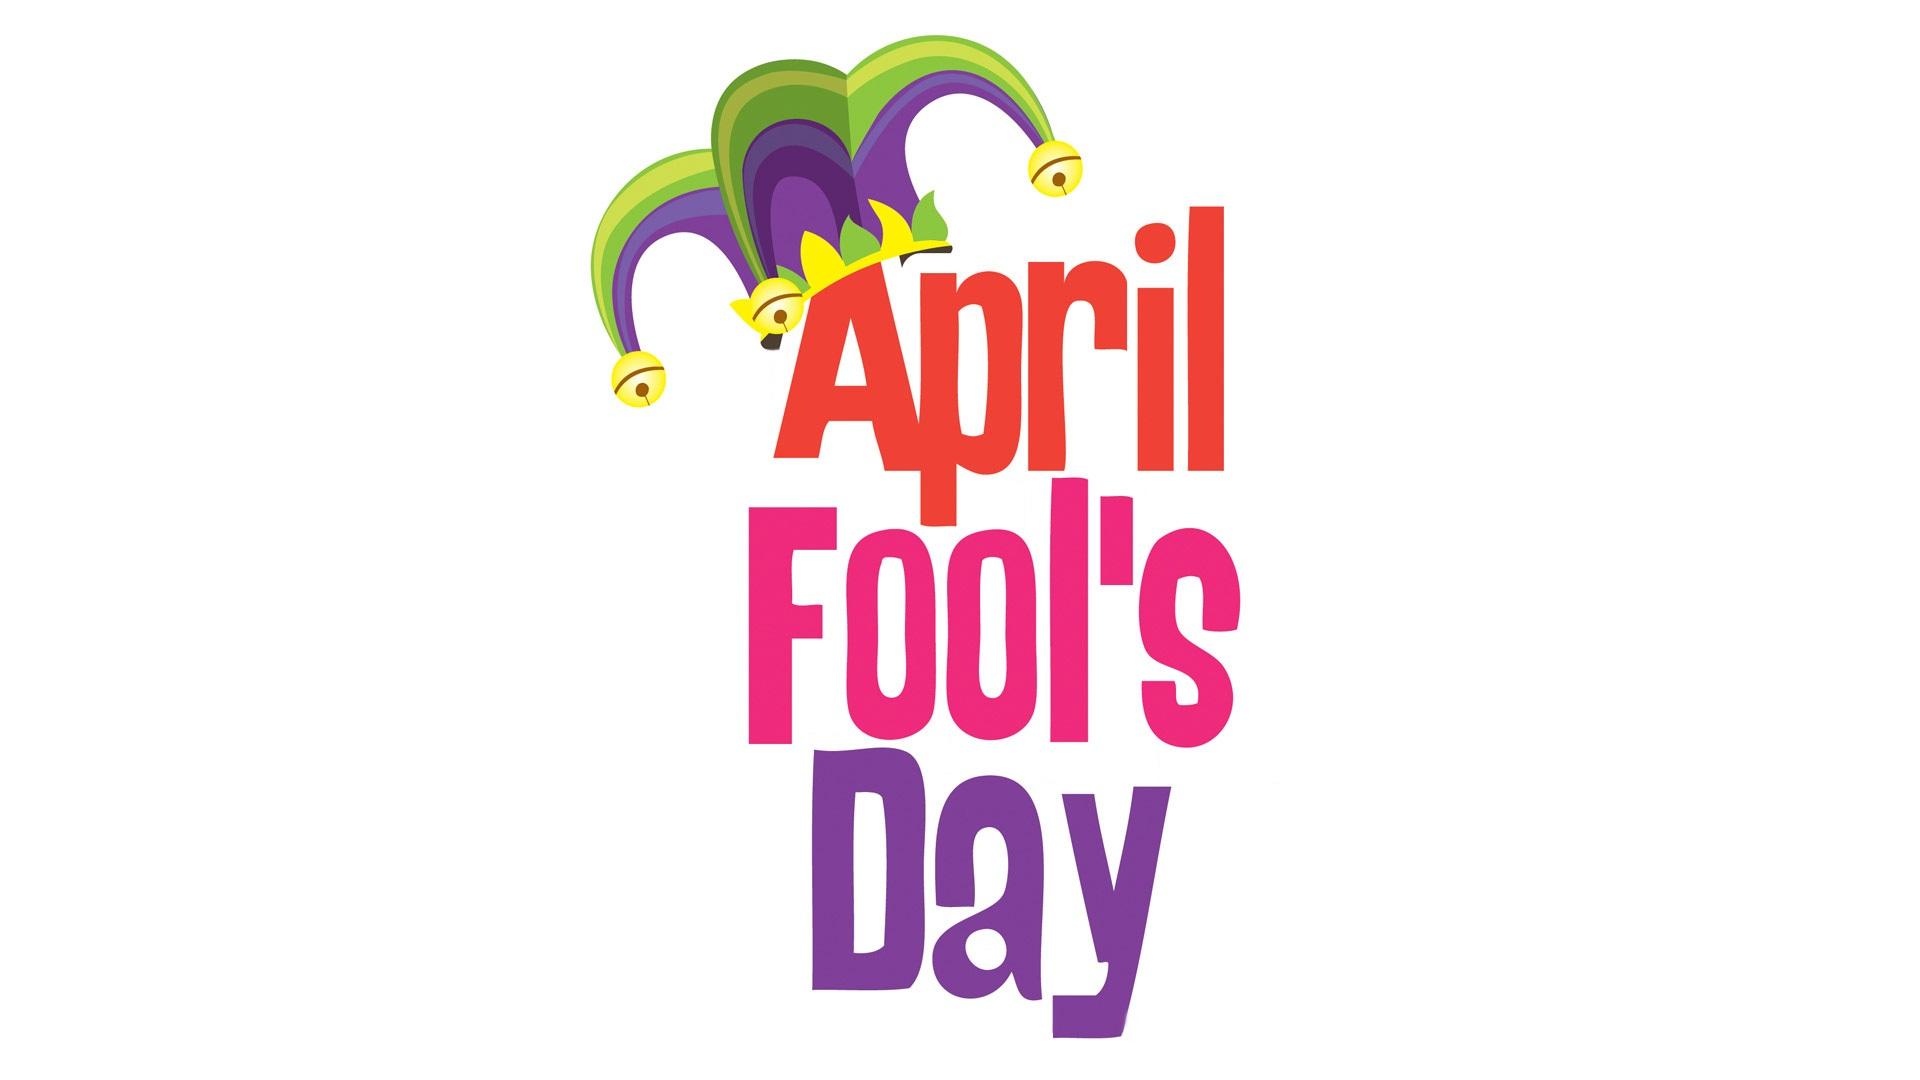 1920x1080 April Fools Day Clipart Wallpapers